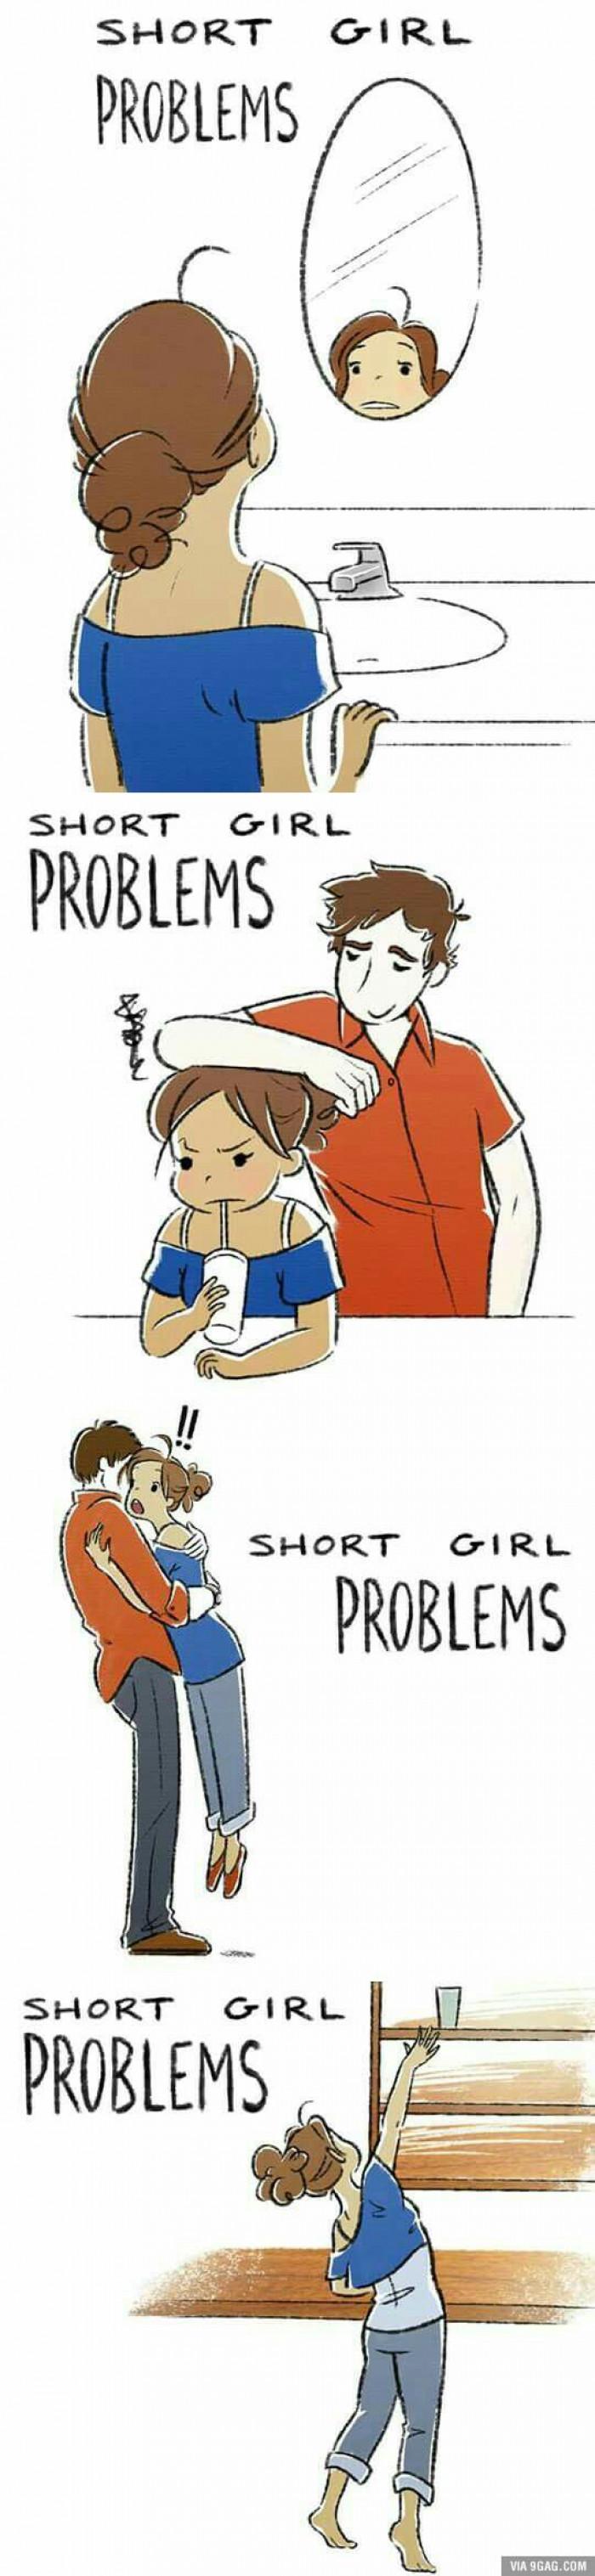 Short Girls Problems